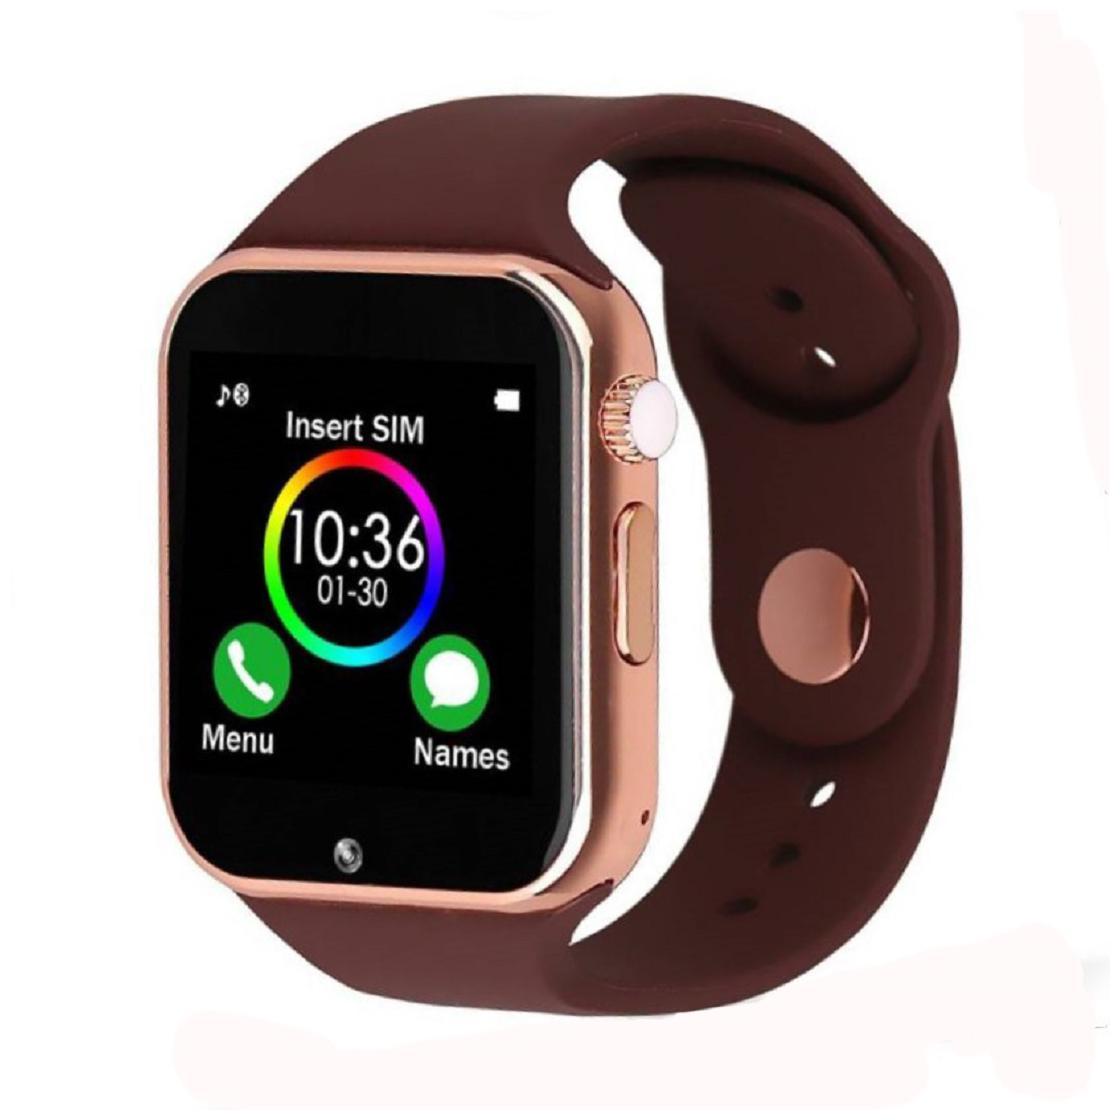 Gen-Y A1 Copper Brown Smartwatch with SIM Slot;Card Slot;Audio Player;Bluetooth;Camera